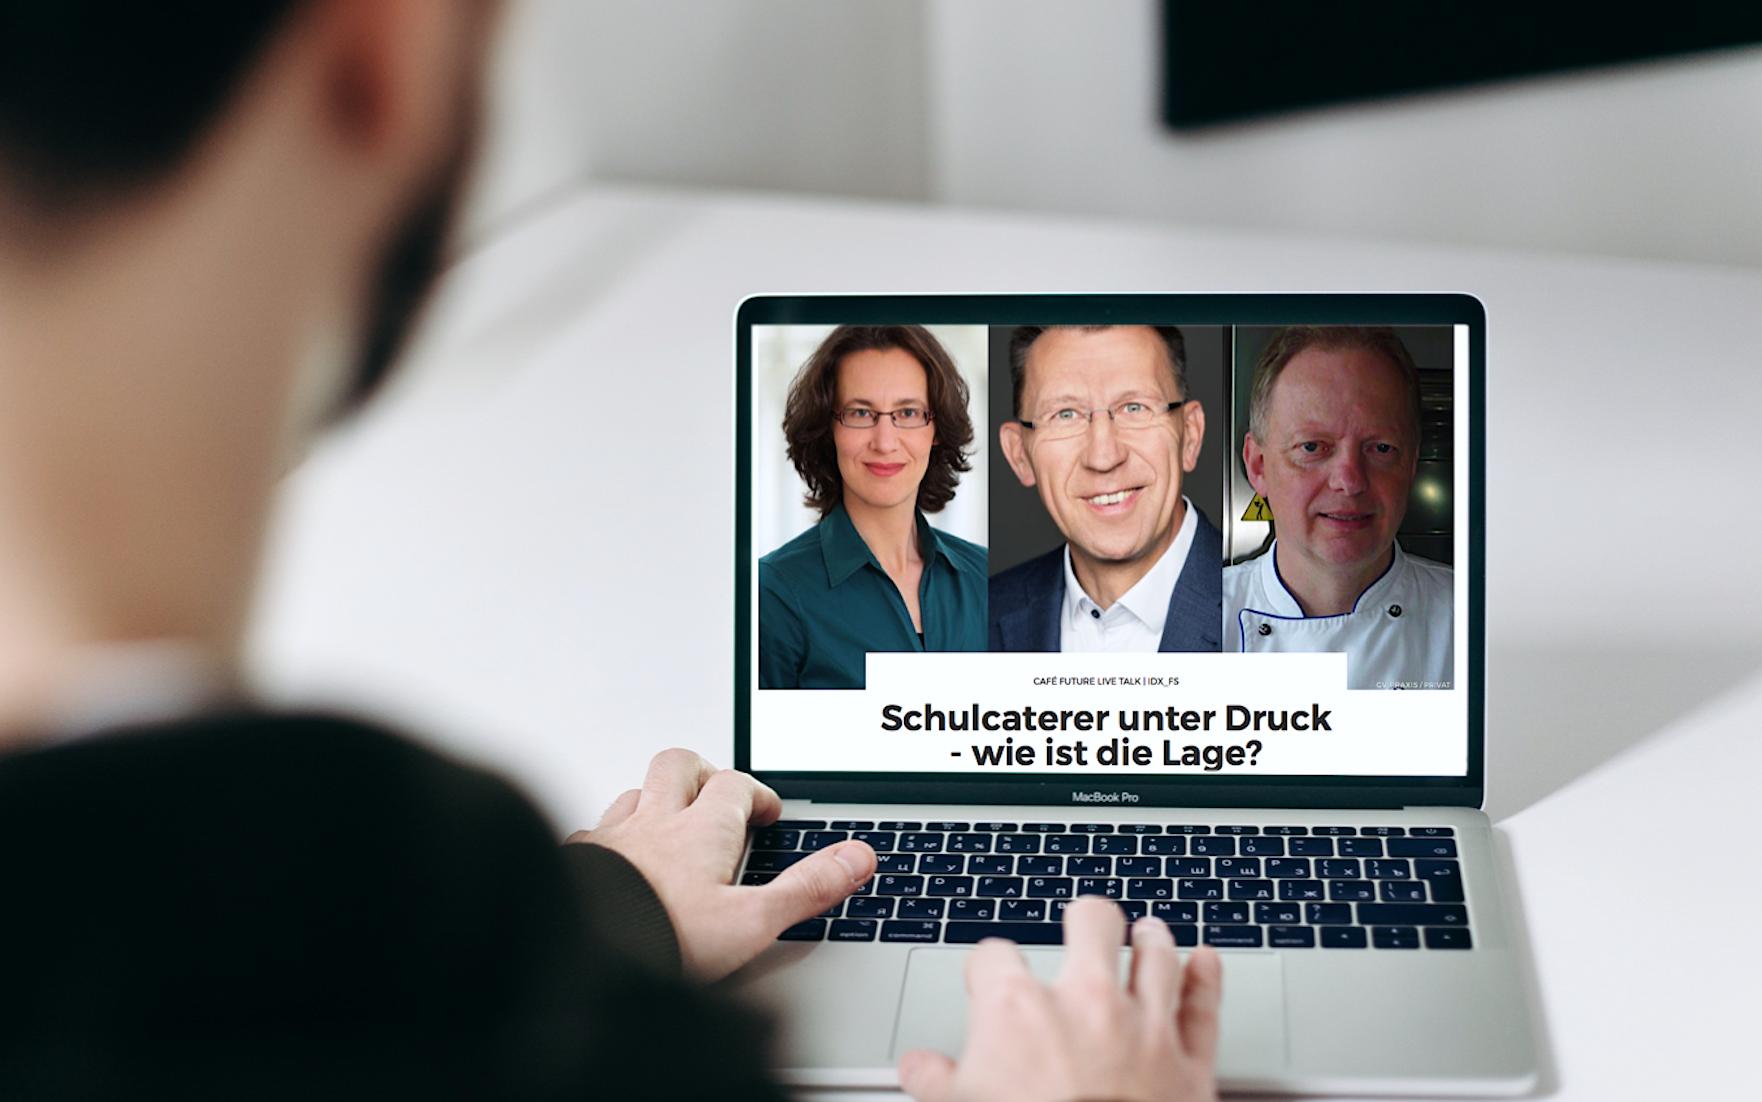 https://www.vdskc.de/wp-content/uploads/2021/03/Cafe-Future_Schulcaterer-unter-Druck.png